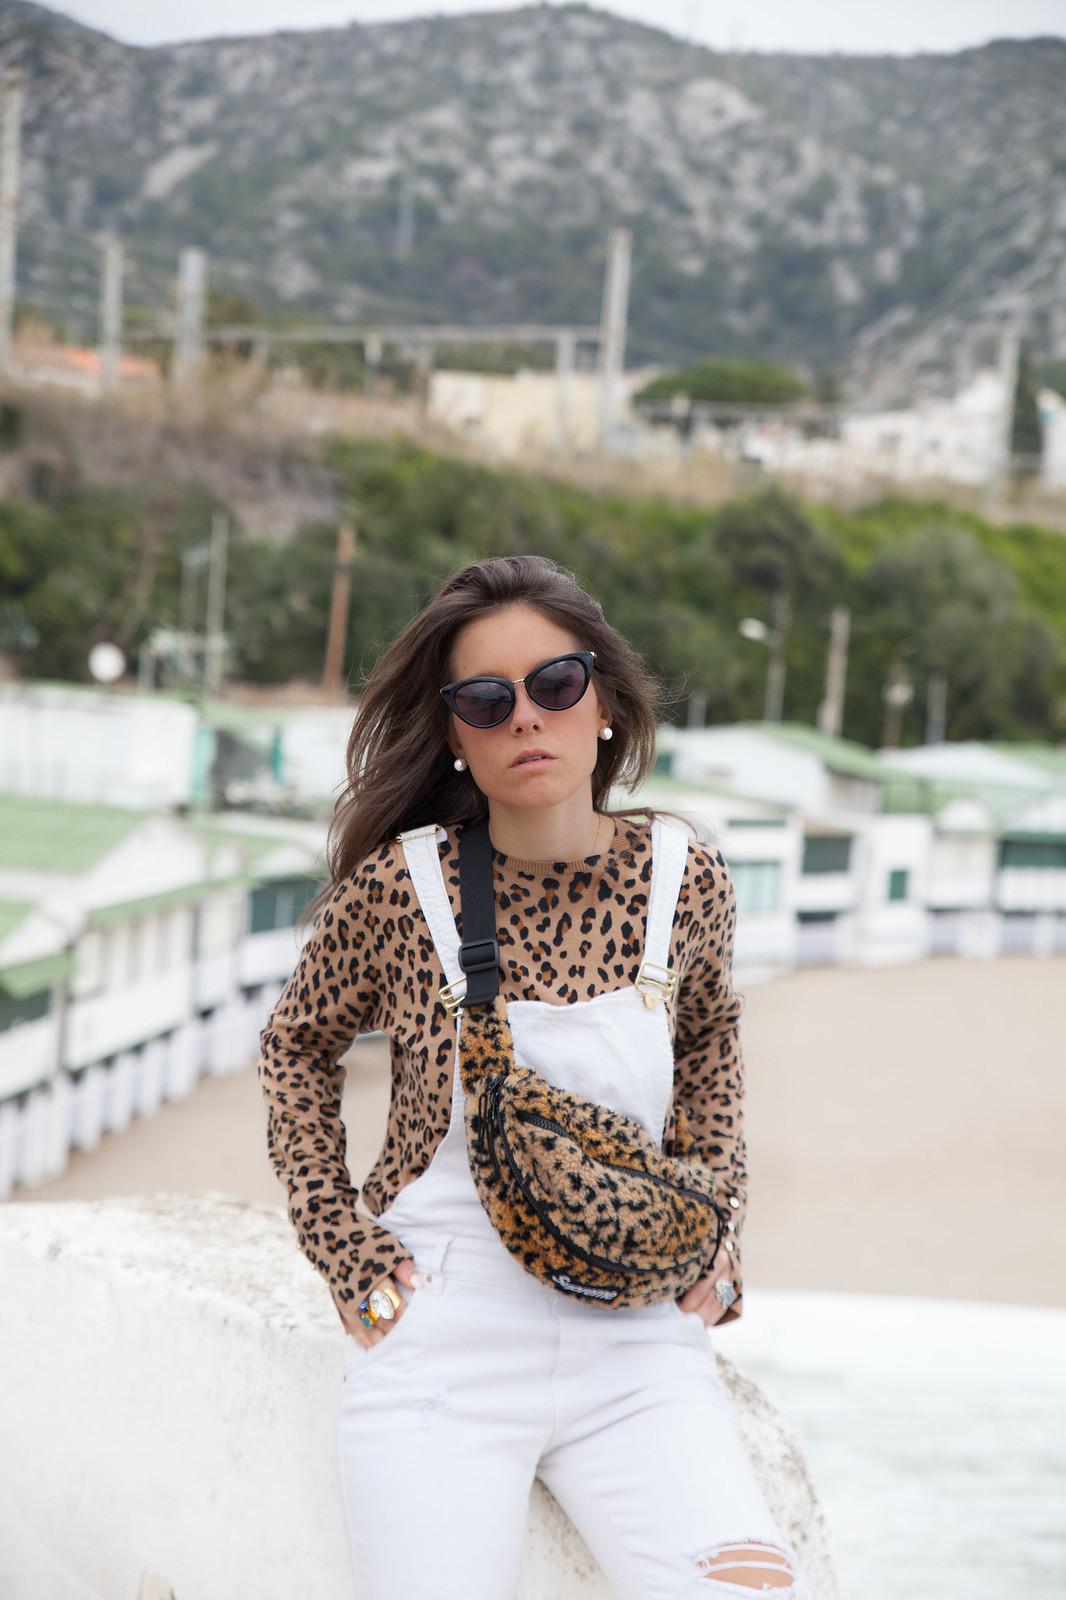 theguestgirl influencer barcelona spain laura santolaria peto blanco